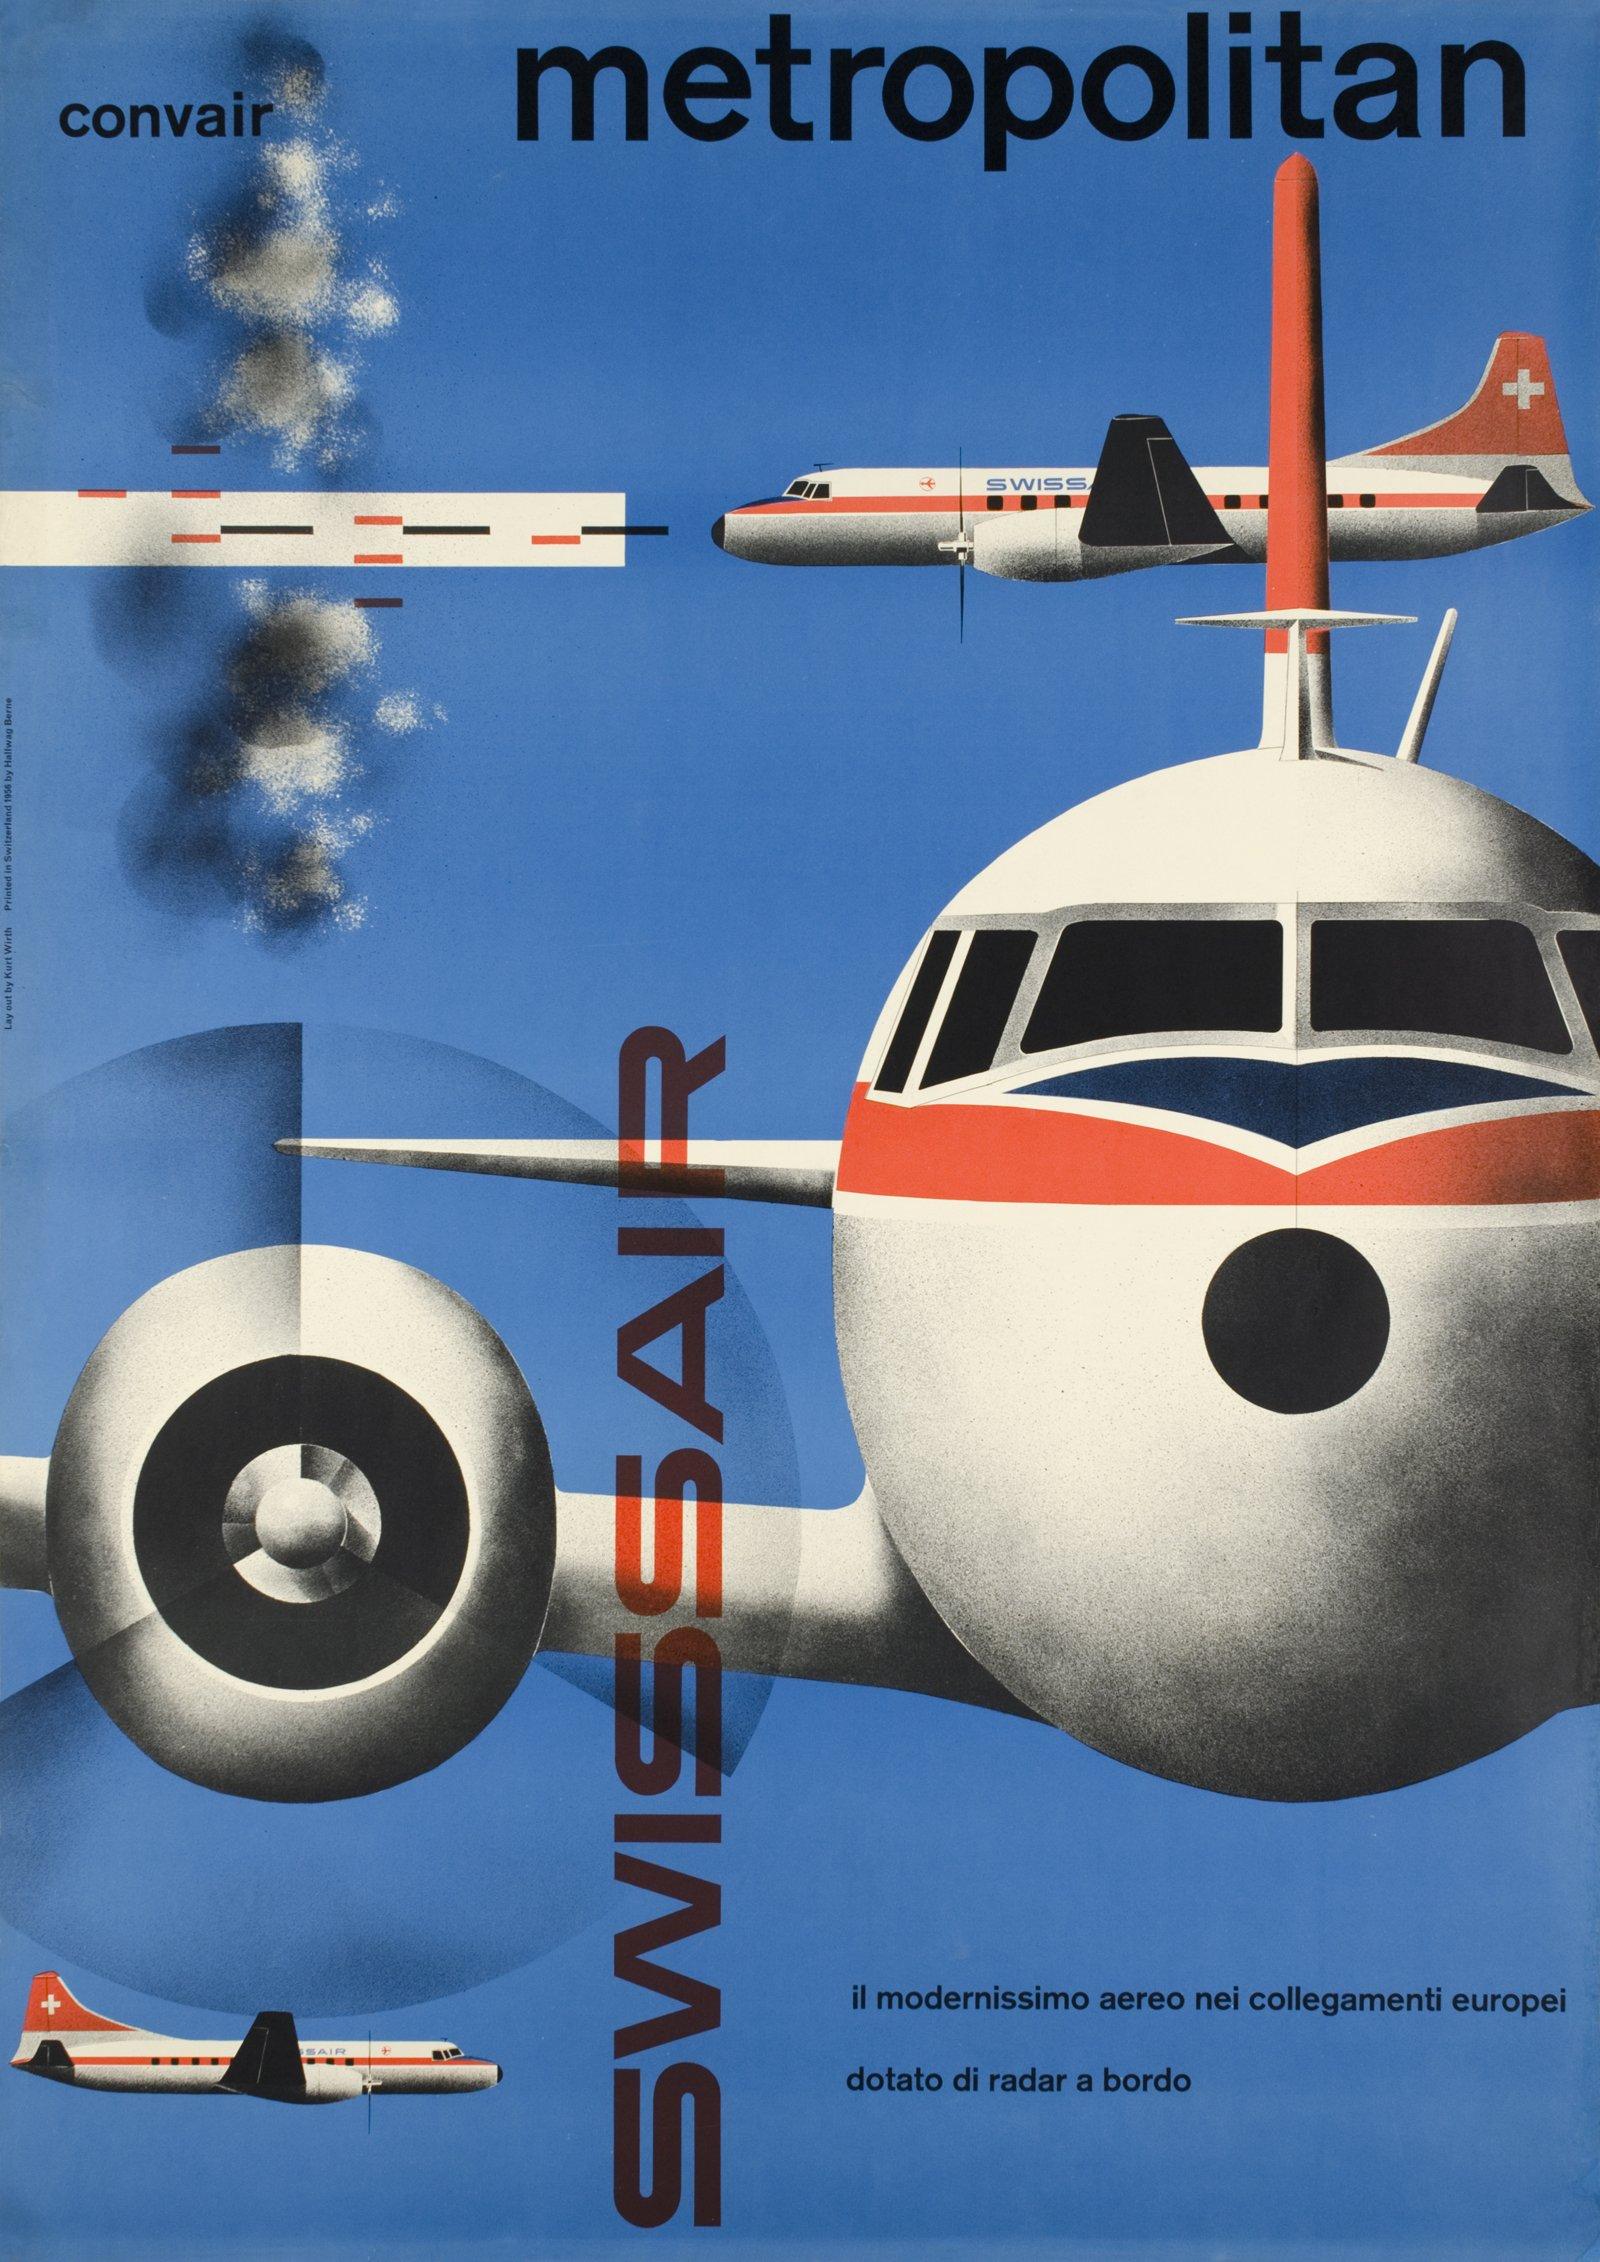 convair metropolitan 30502 avion vintage